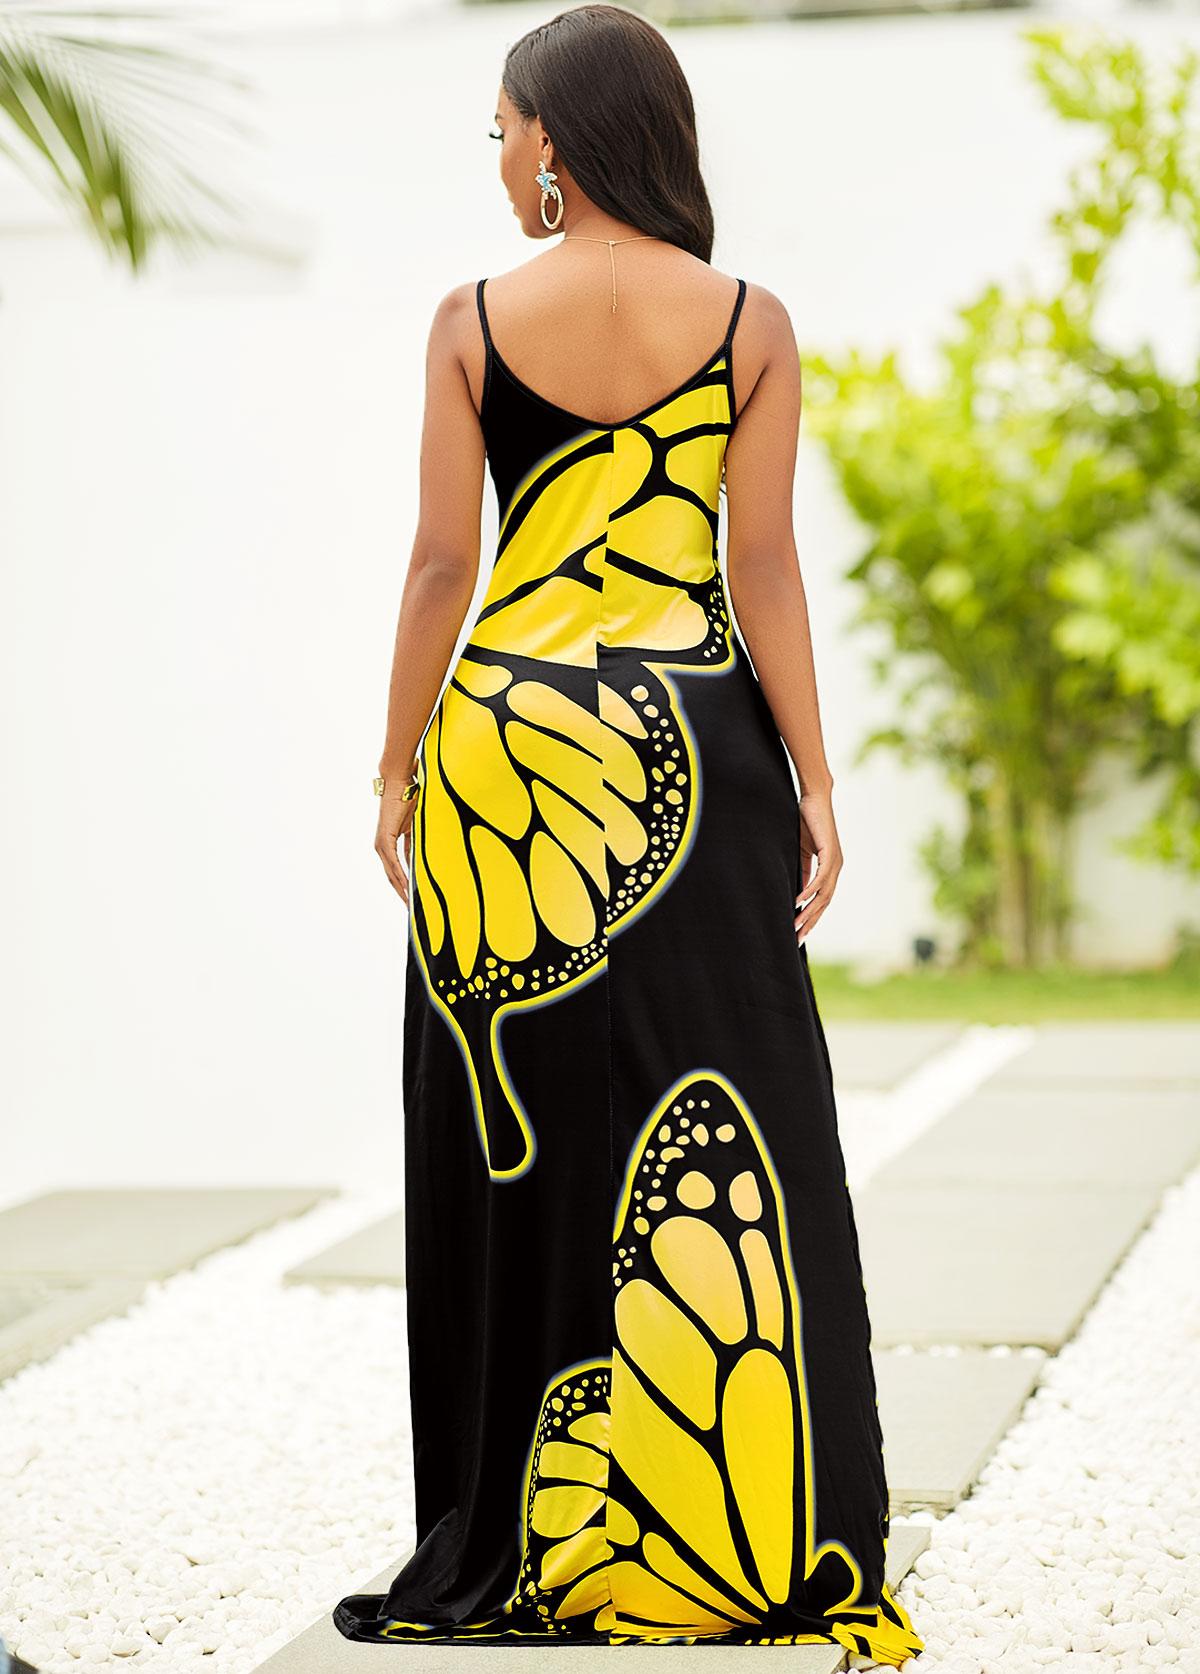 Butterfly Print Spaghetti Strap Maxi Dress